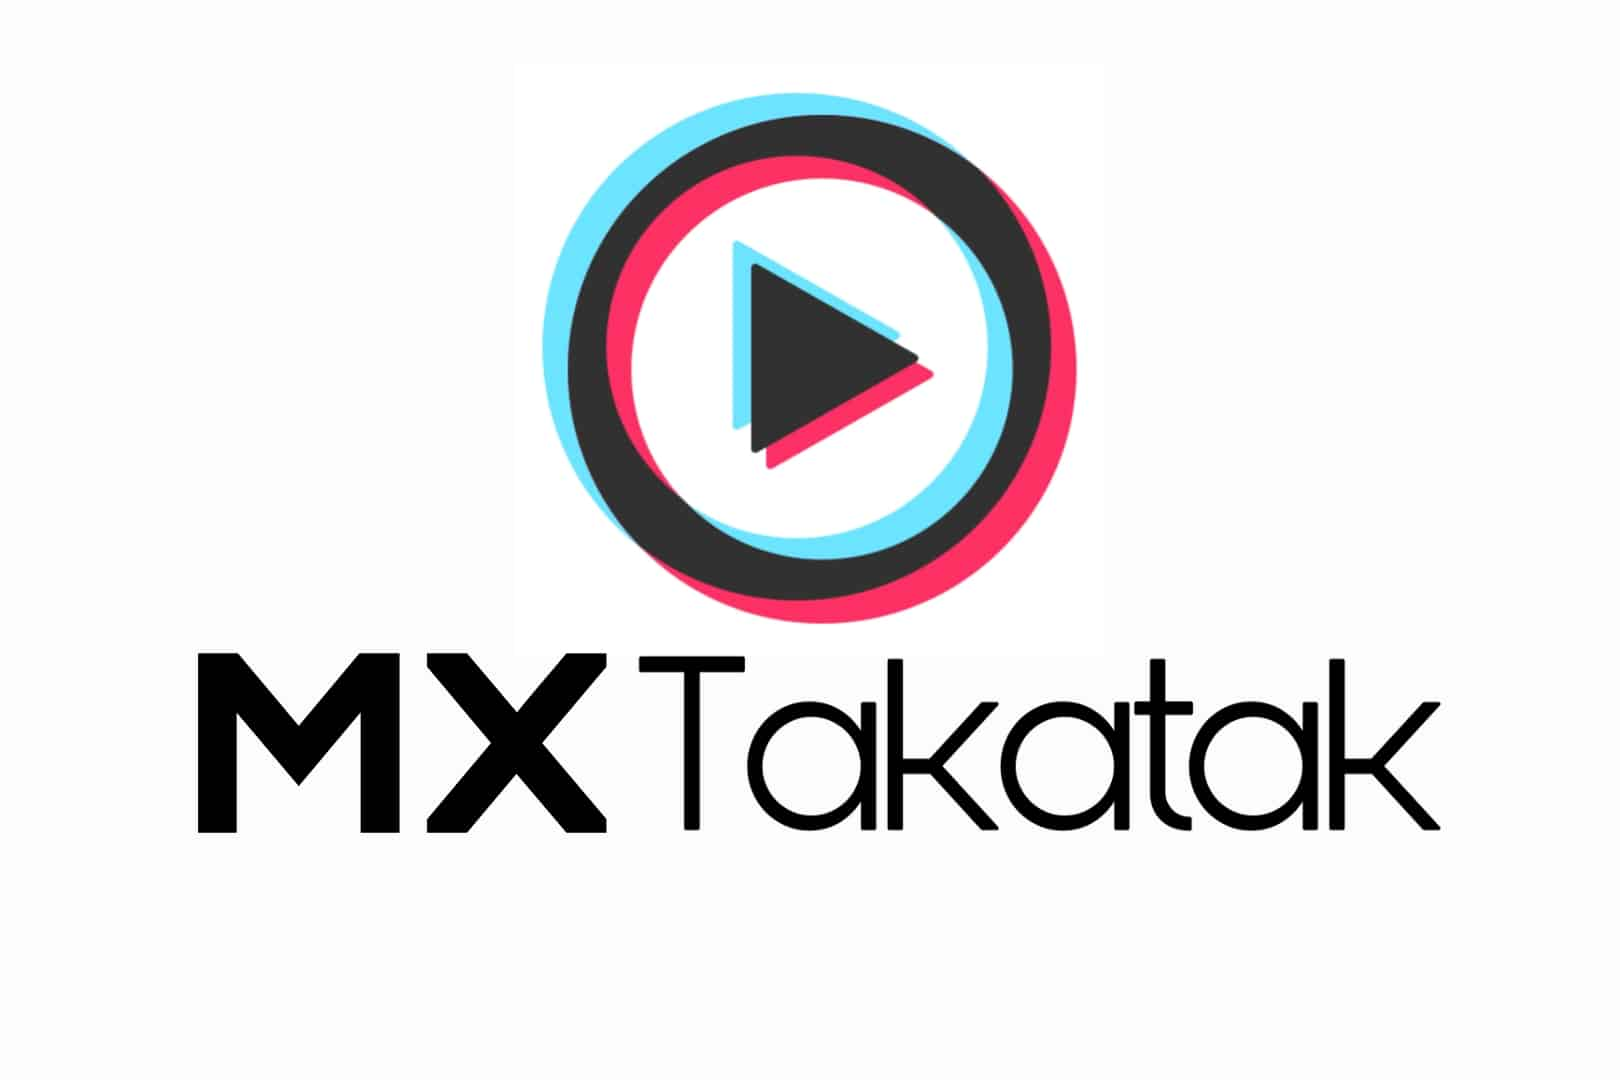 Tiktok Alternative - MX Takatak